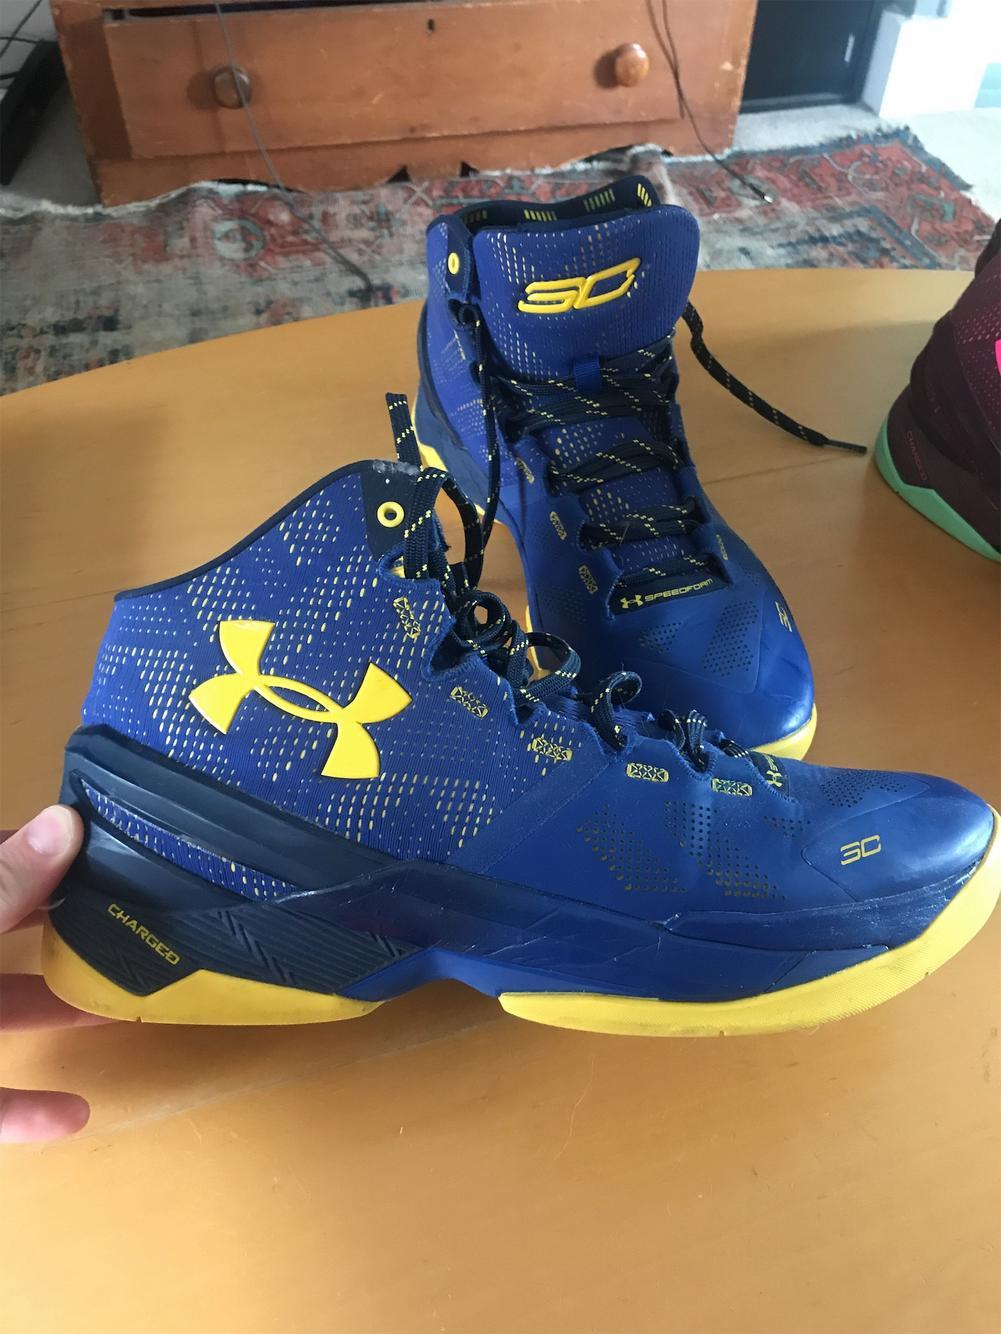 marrón girasol abrazo  Under Armour Curry 2 Size 11.5 | Basketball Shoes